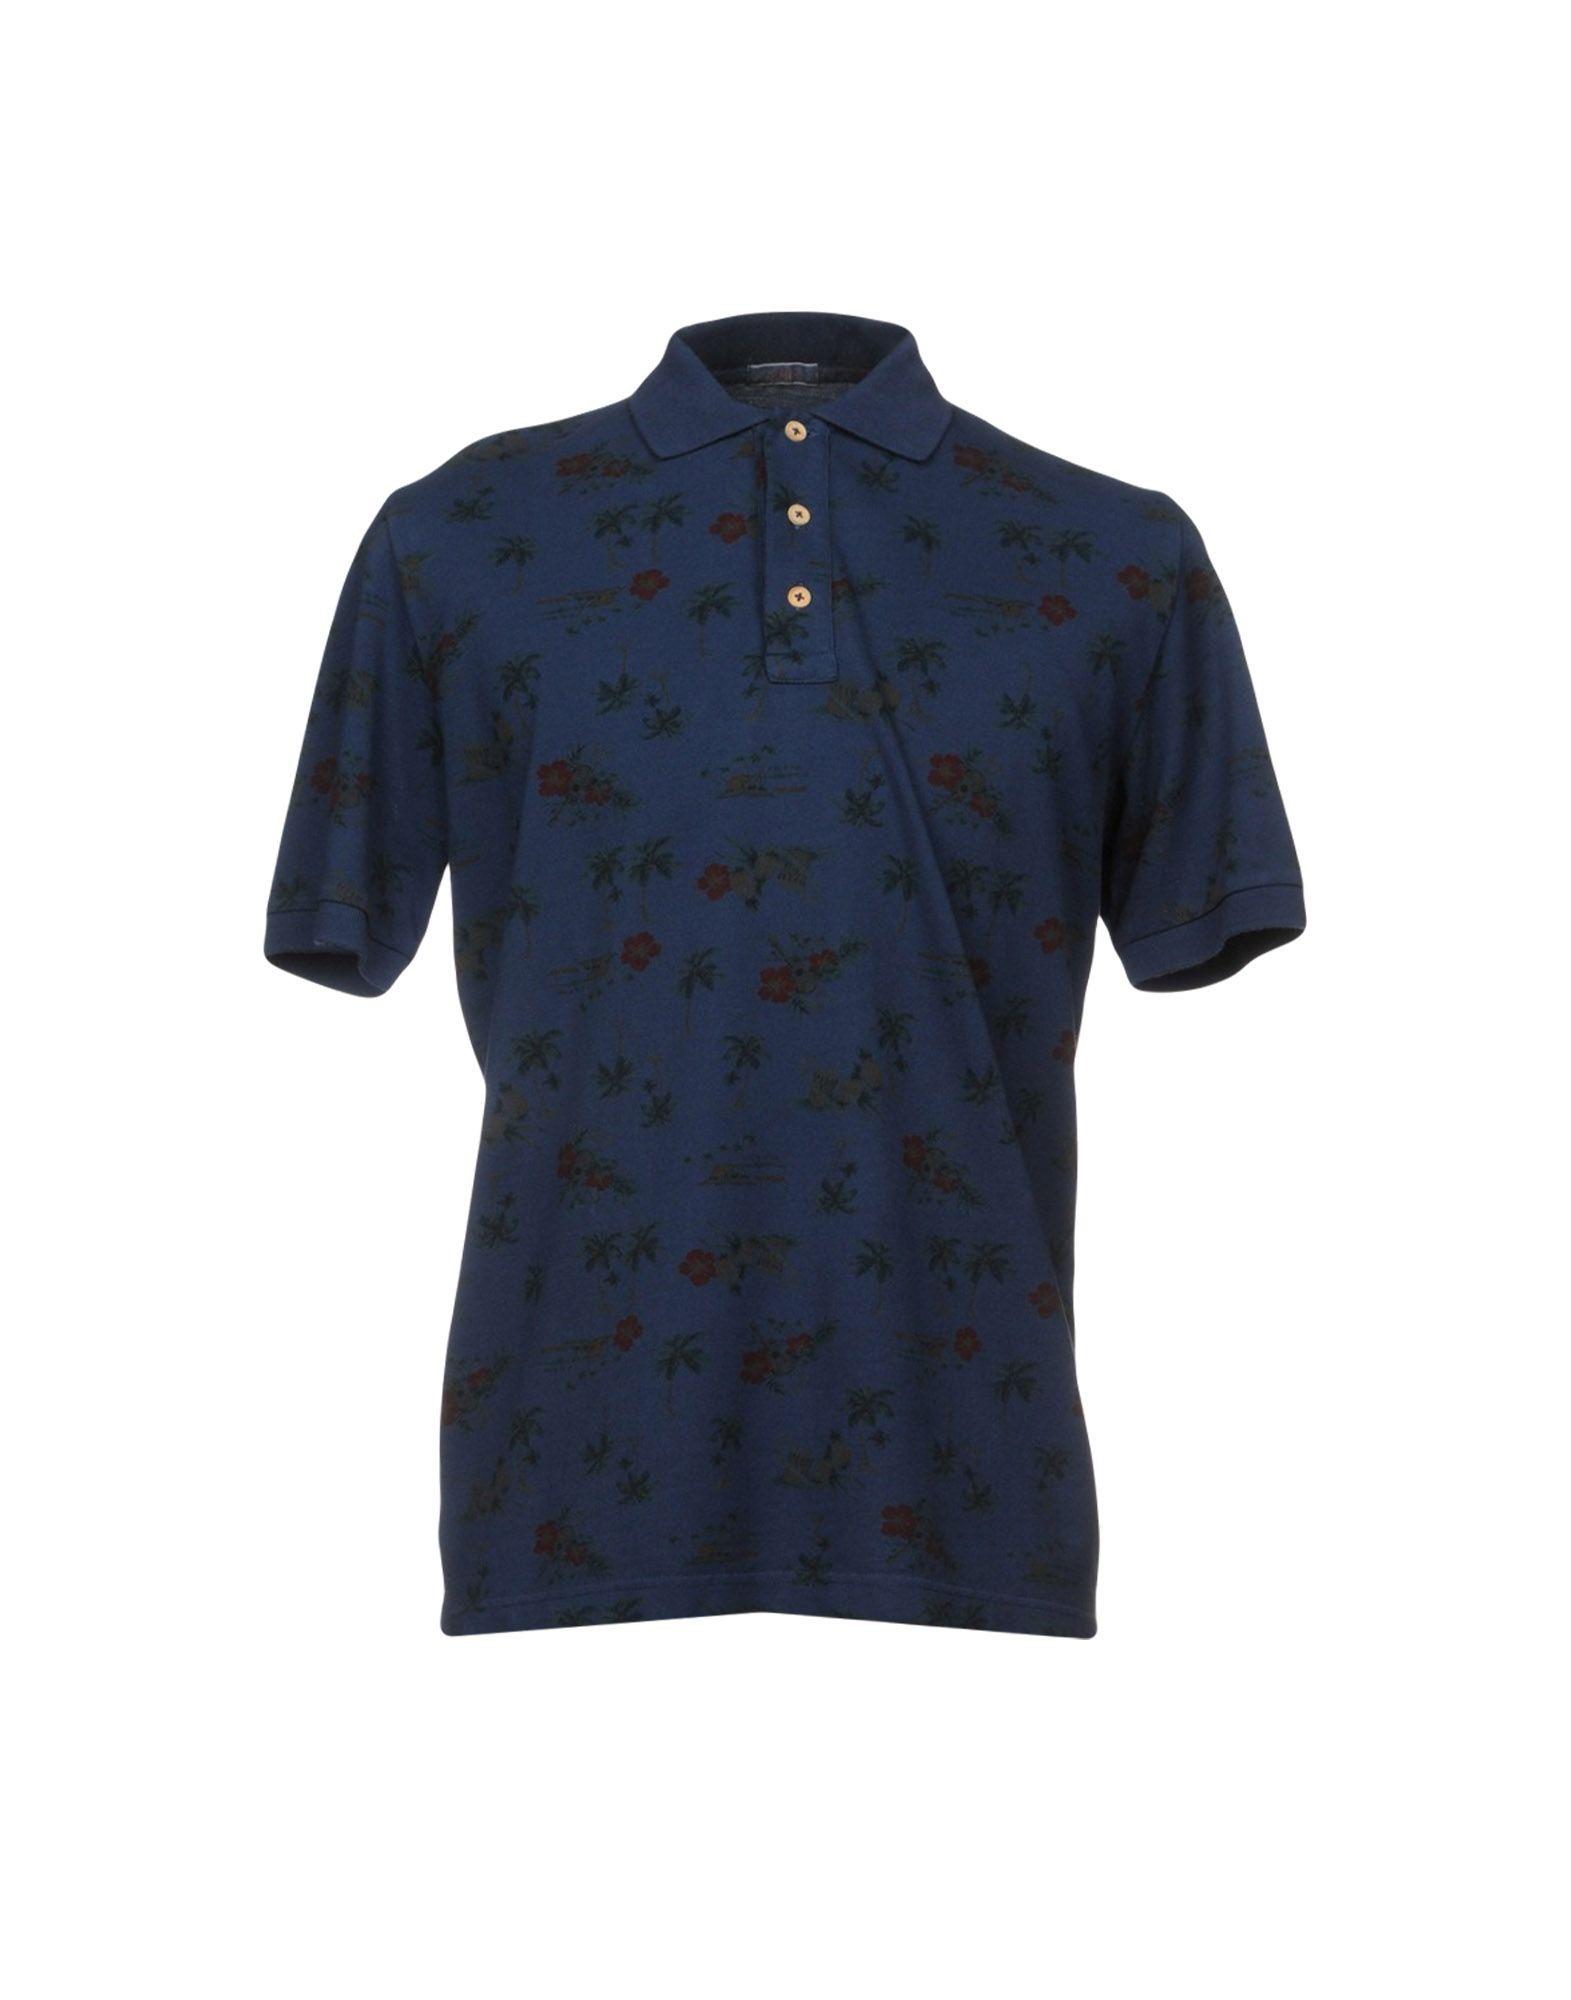 ALTEA dal 1973 Поло altea dal 1973 джинсовая рубашка